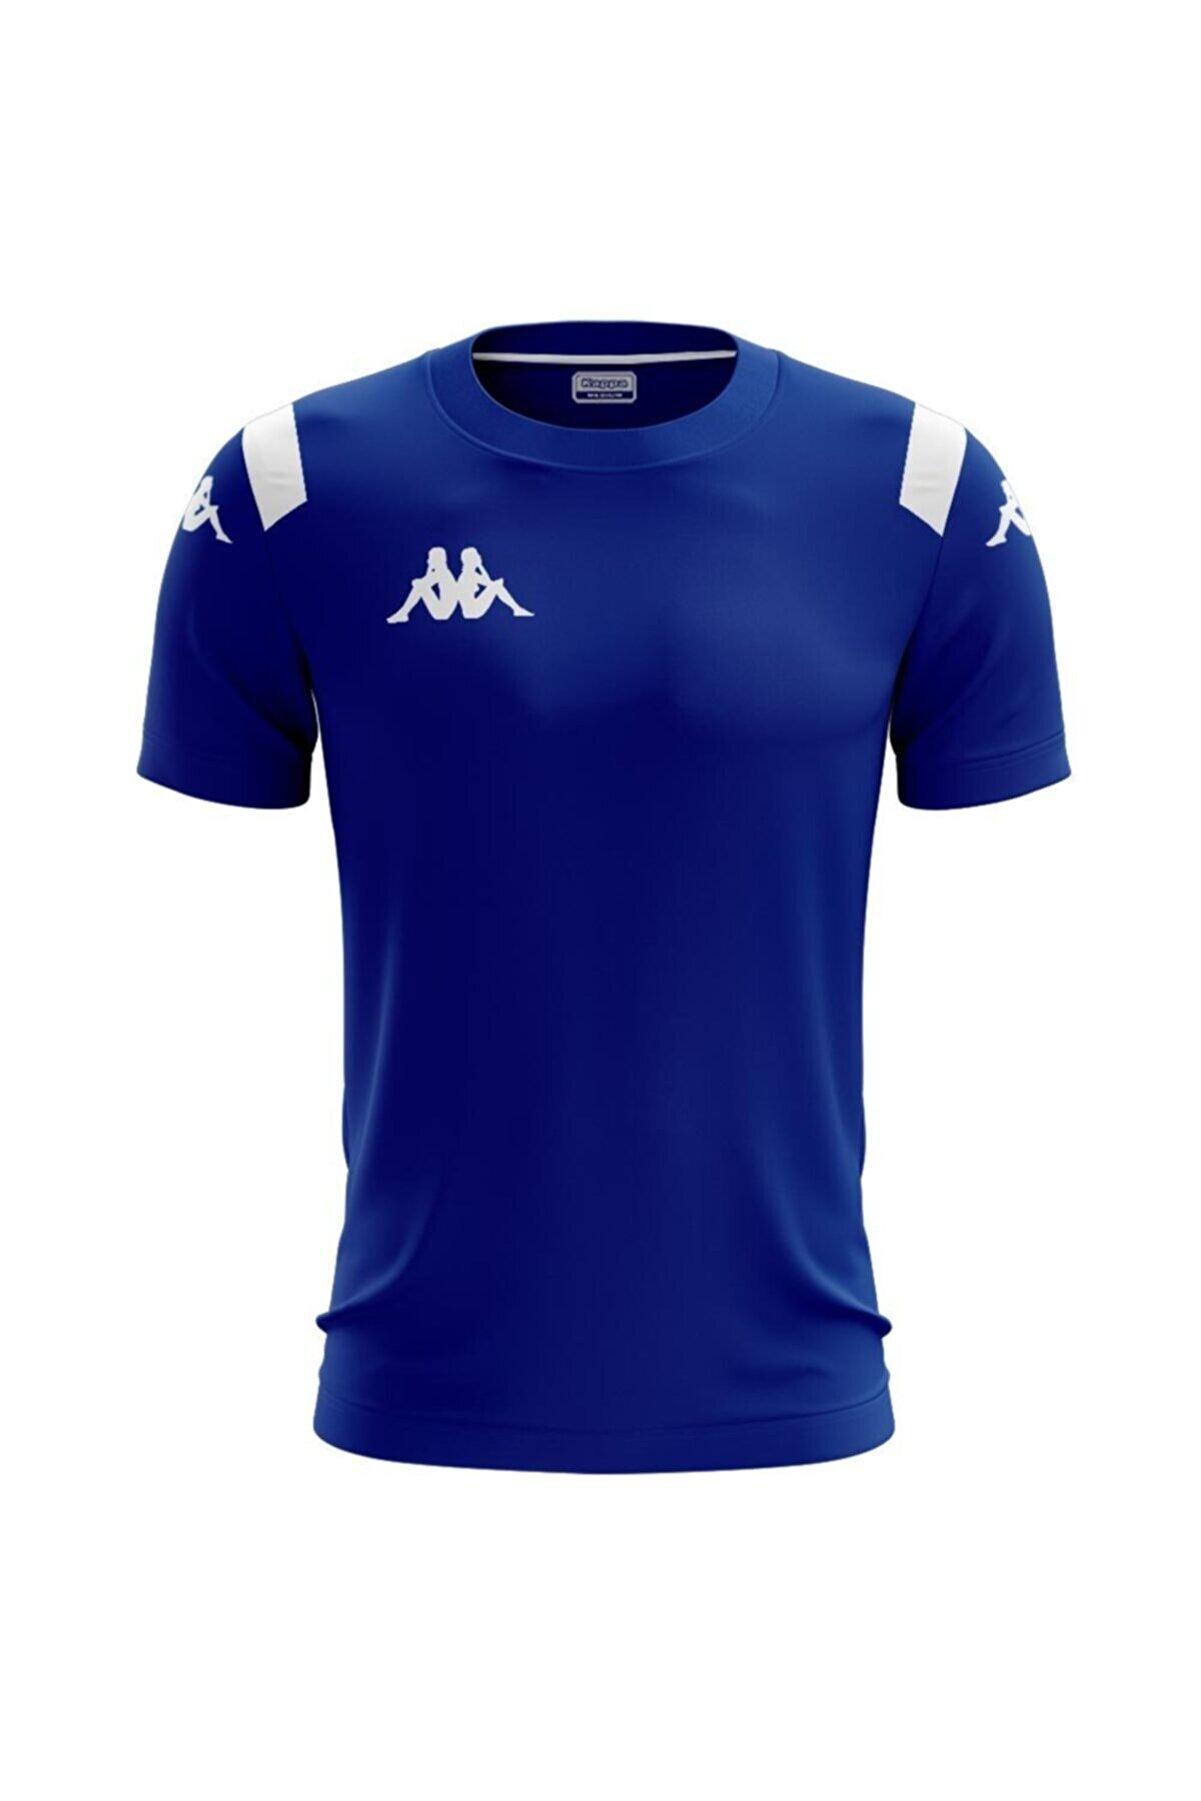 Kappa Erkek Saks Player Ant. T-shirt Abaou4 Spor T-Shirt